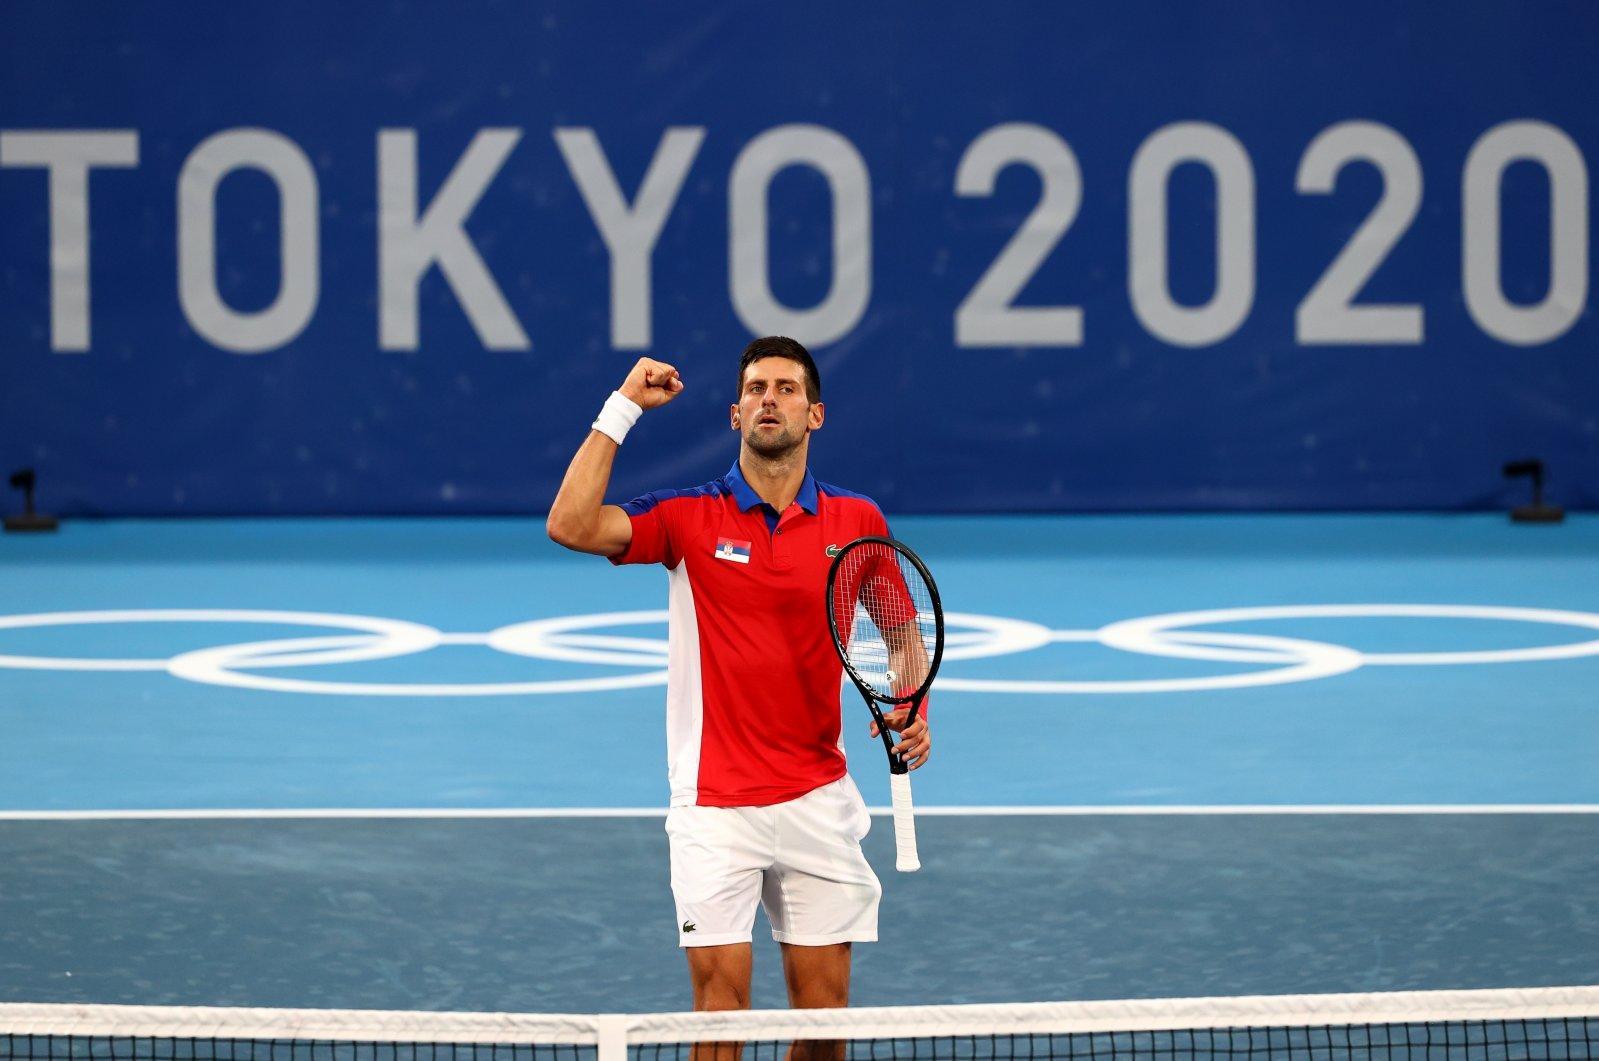 Serbia's Novak Djokovic celebrates after winning his Tokyo 2020 Olympics Tennis Men's Singles second-round match against Germany's Jan-Lennard Struff, Ariake Tennis Park, Tokyo, Japan, July 26, 2021.